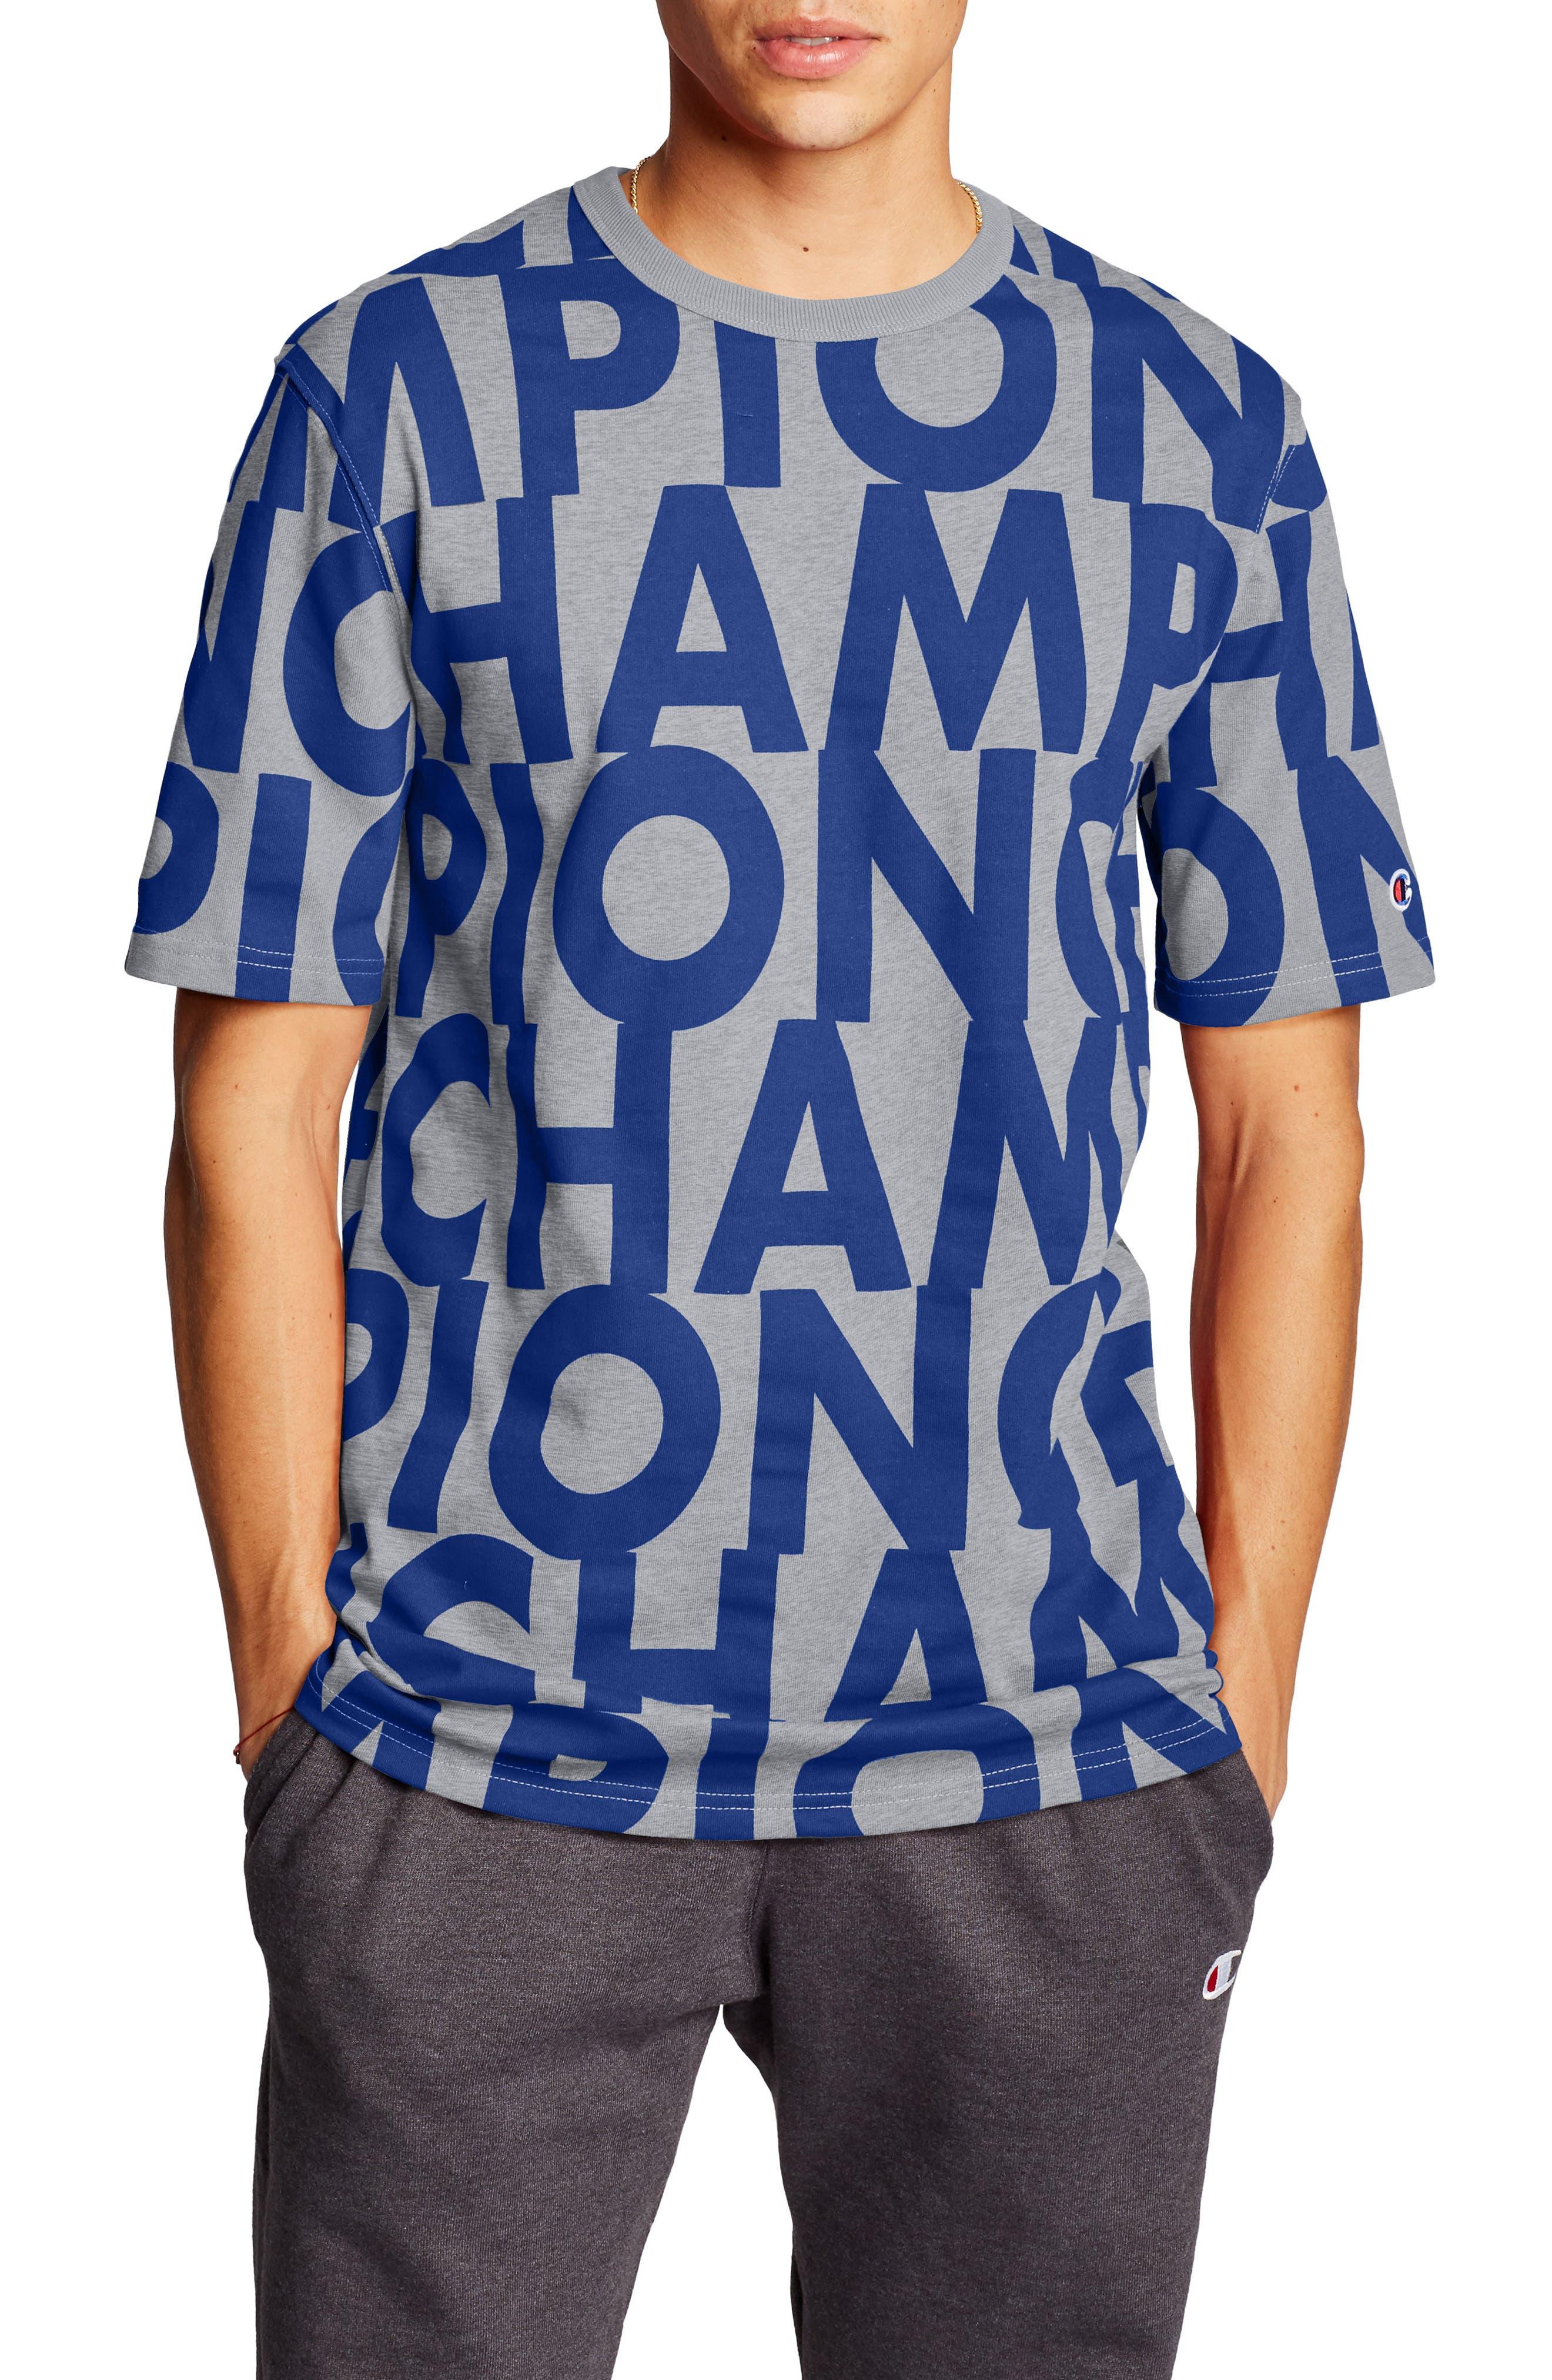 Champion Heritage Girls Kids Clothes Original Script Tank Top Shirt